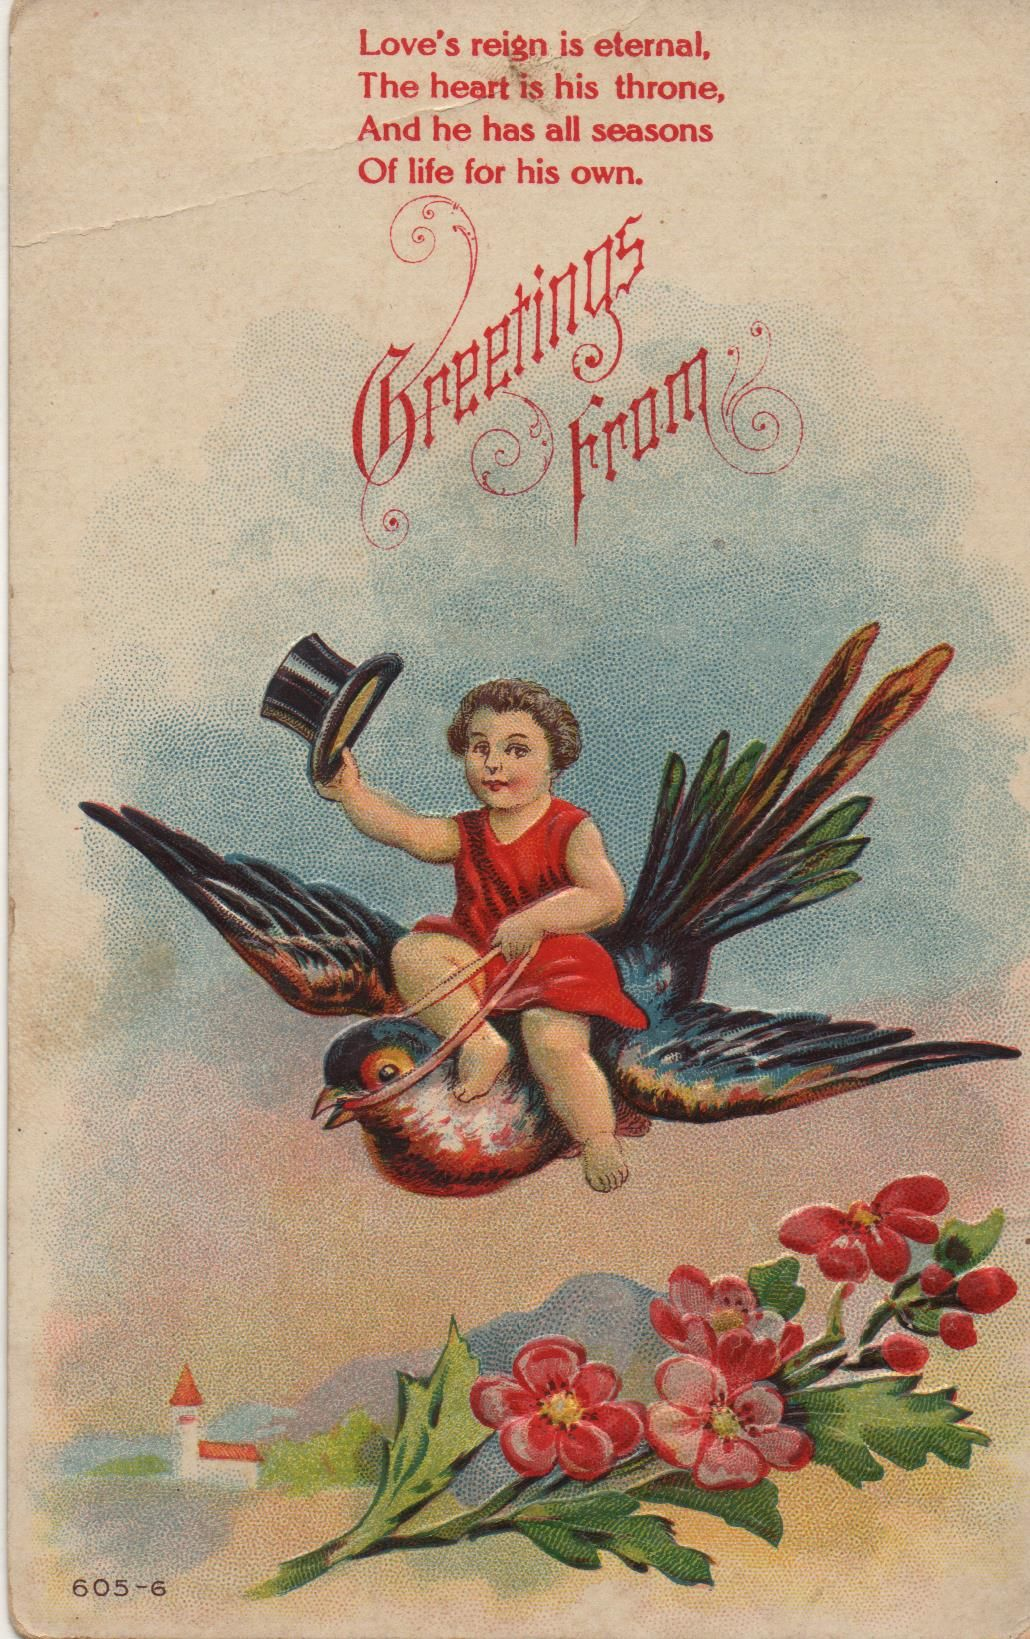 1908 postcard. Hagins collection.